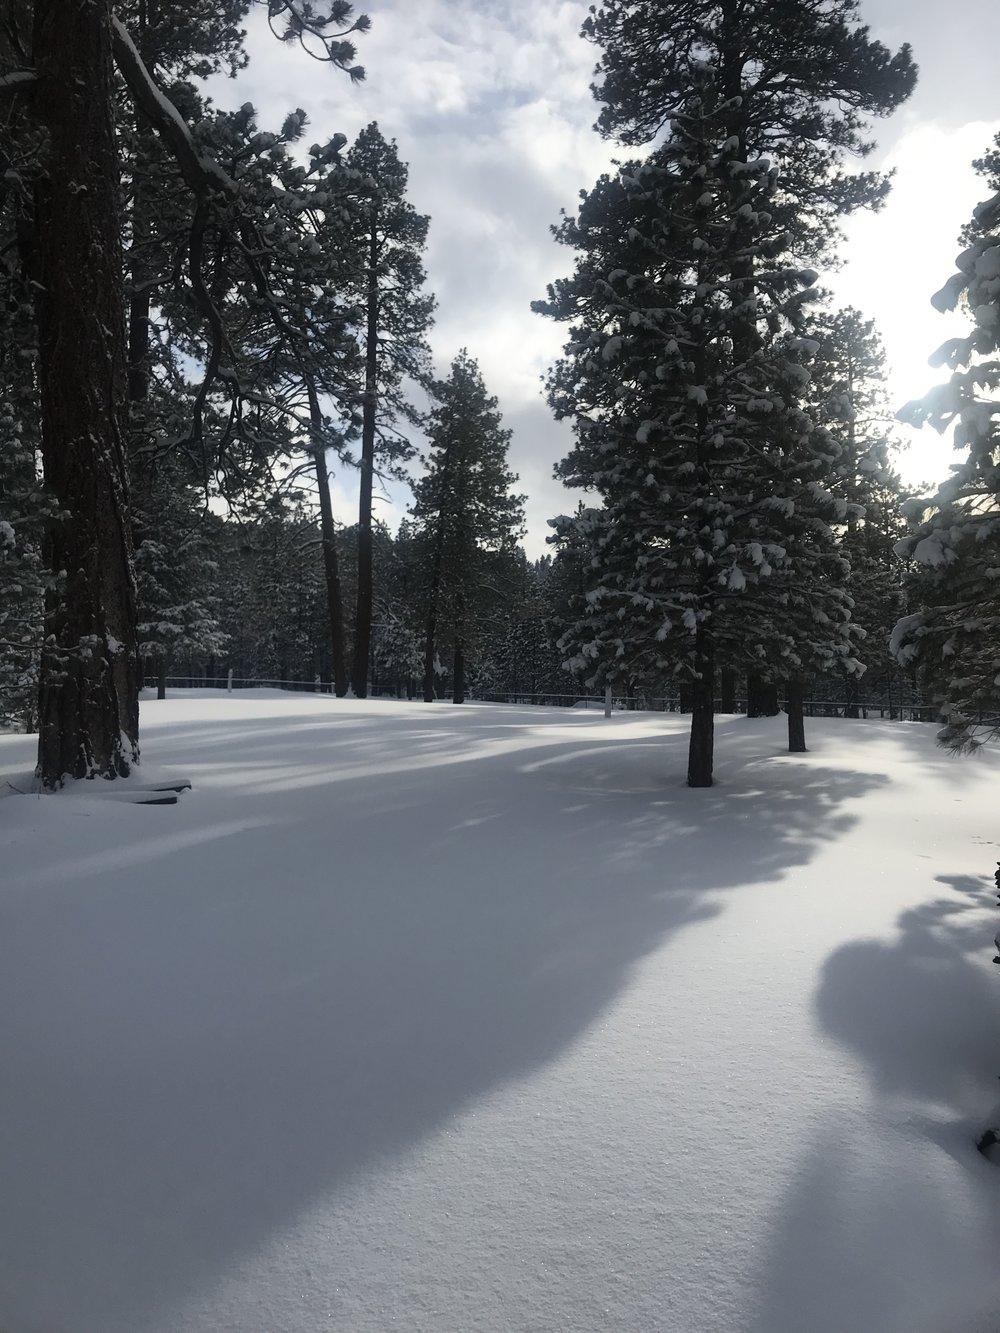 Snow Blanket - Big Bear Lake, CA